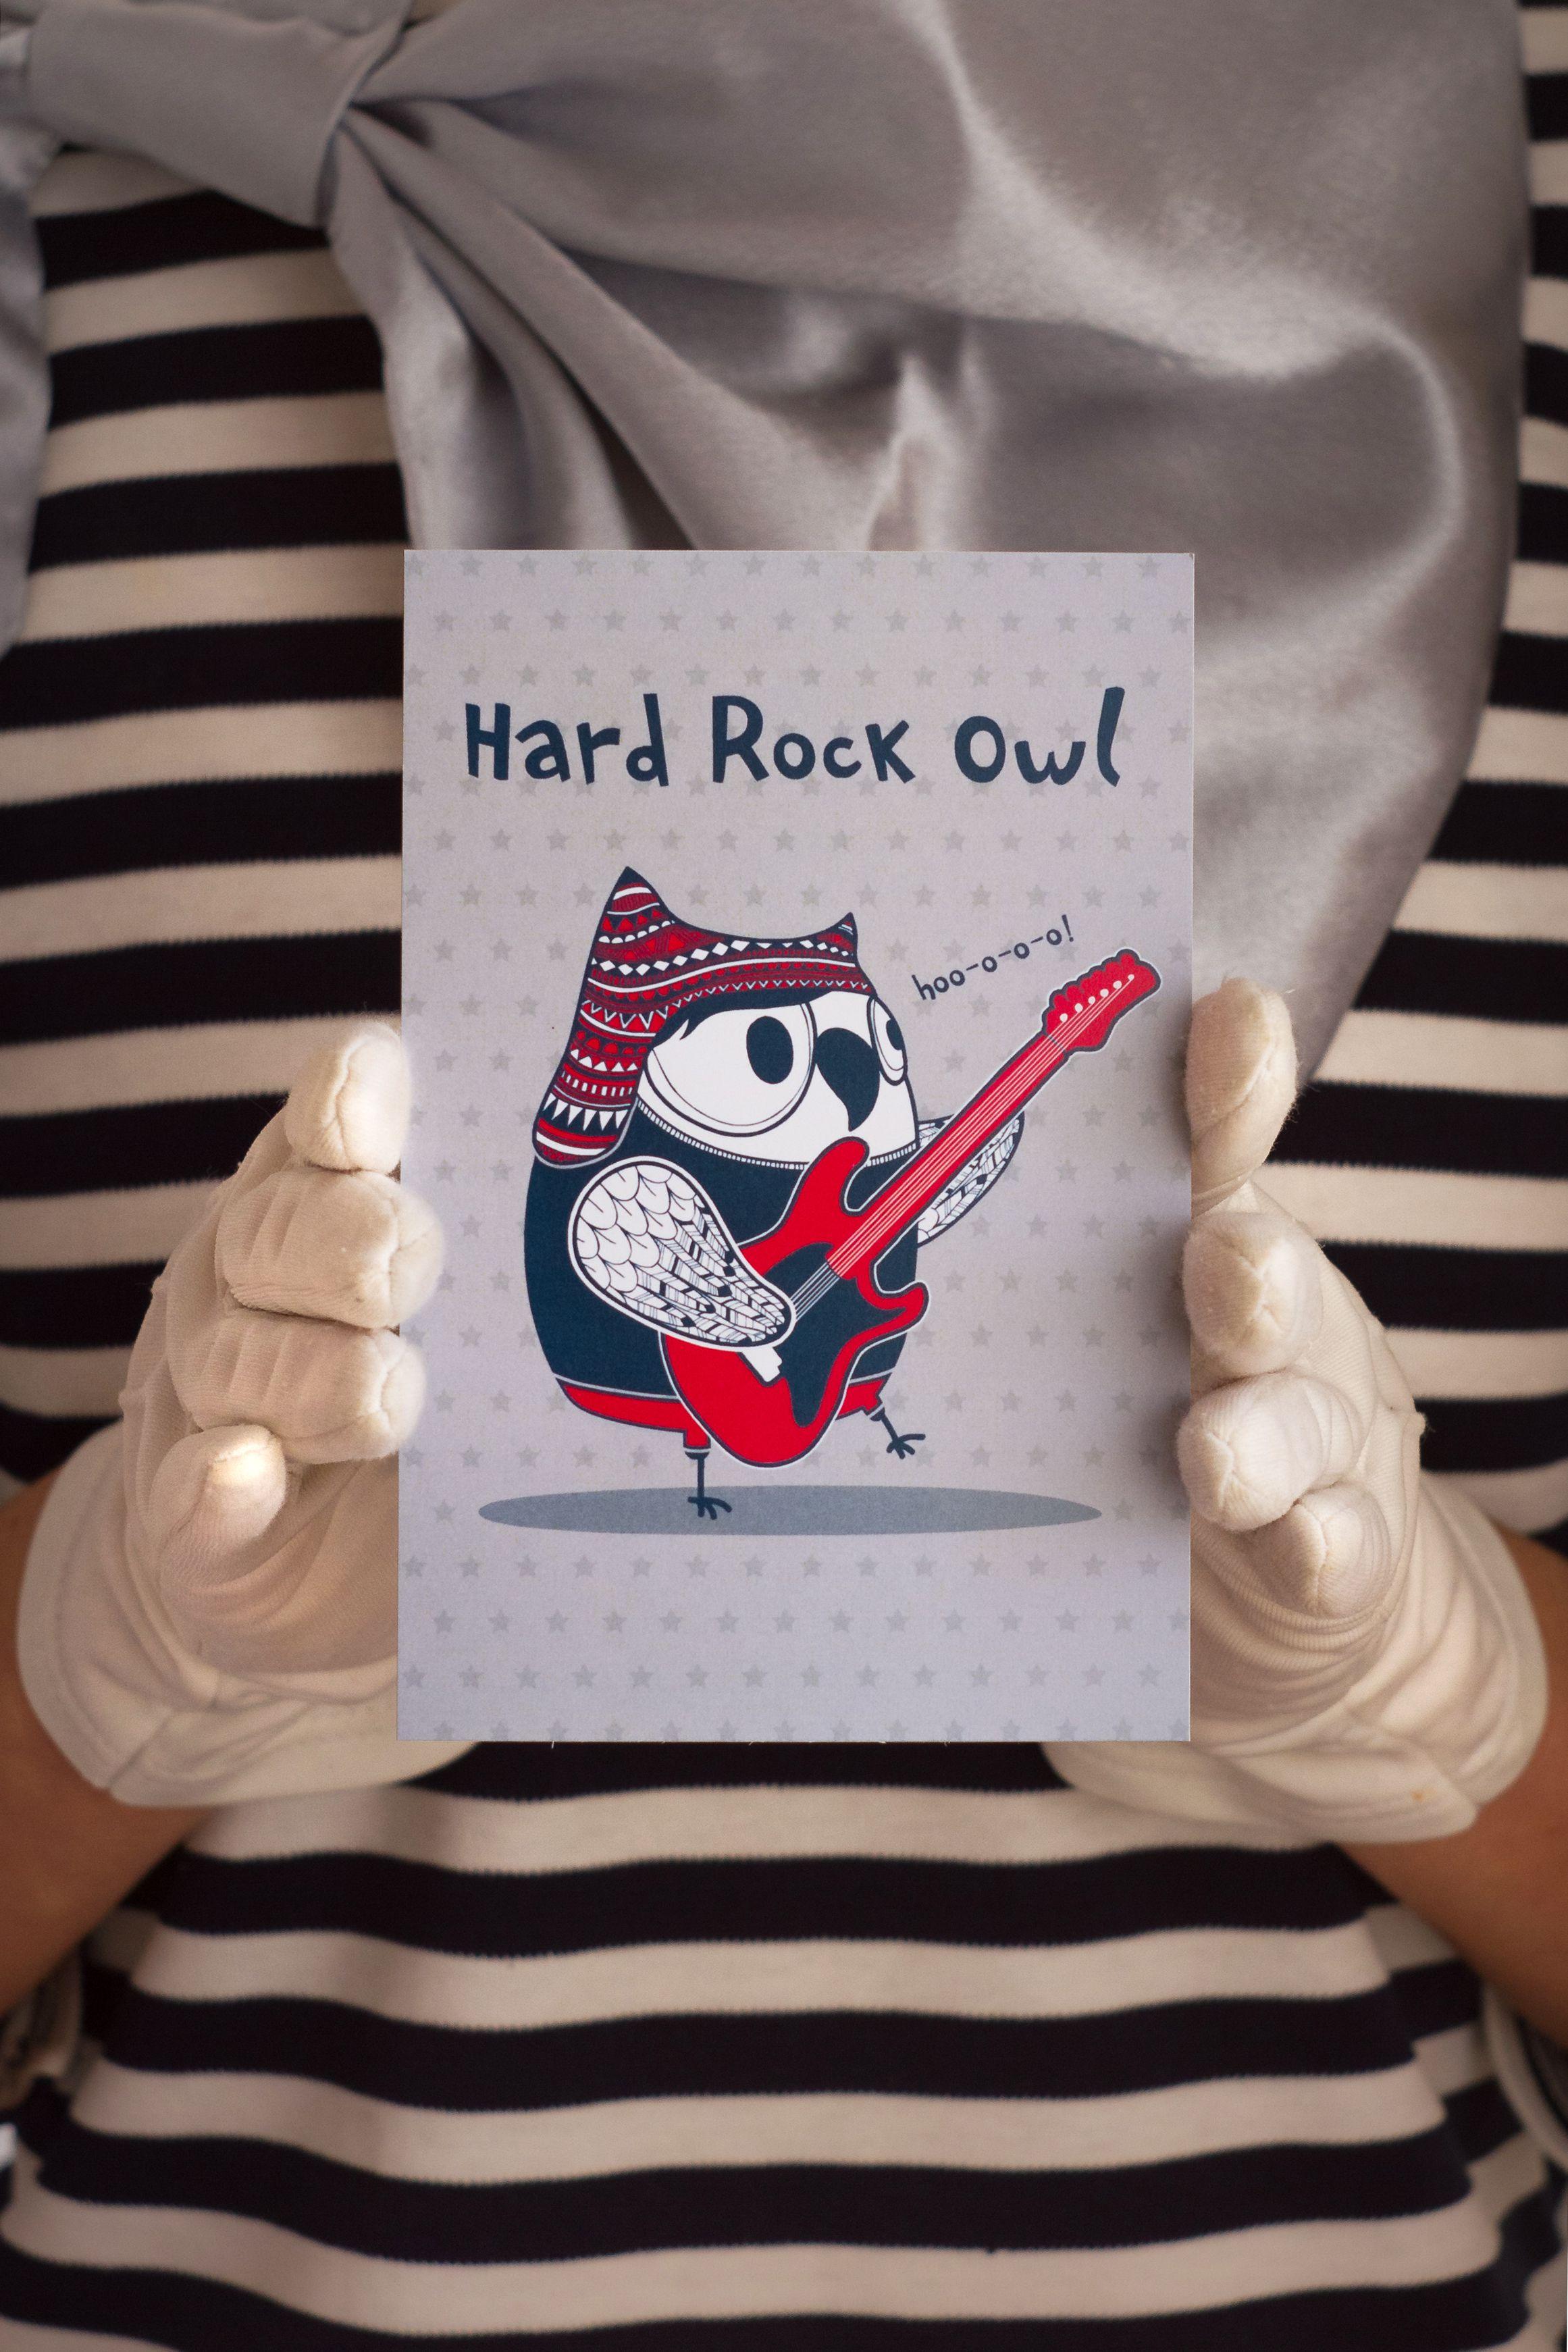 rock surprise present postcard owl hard